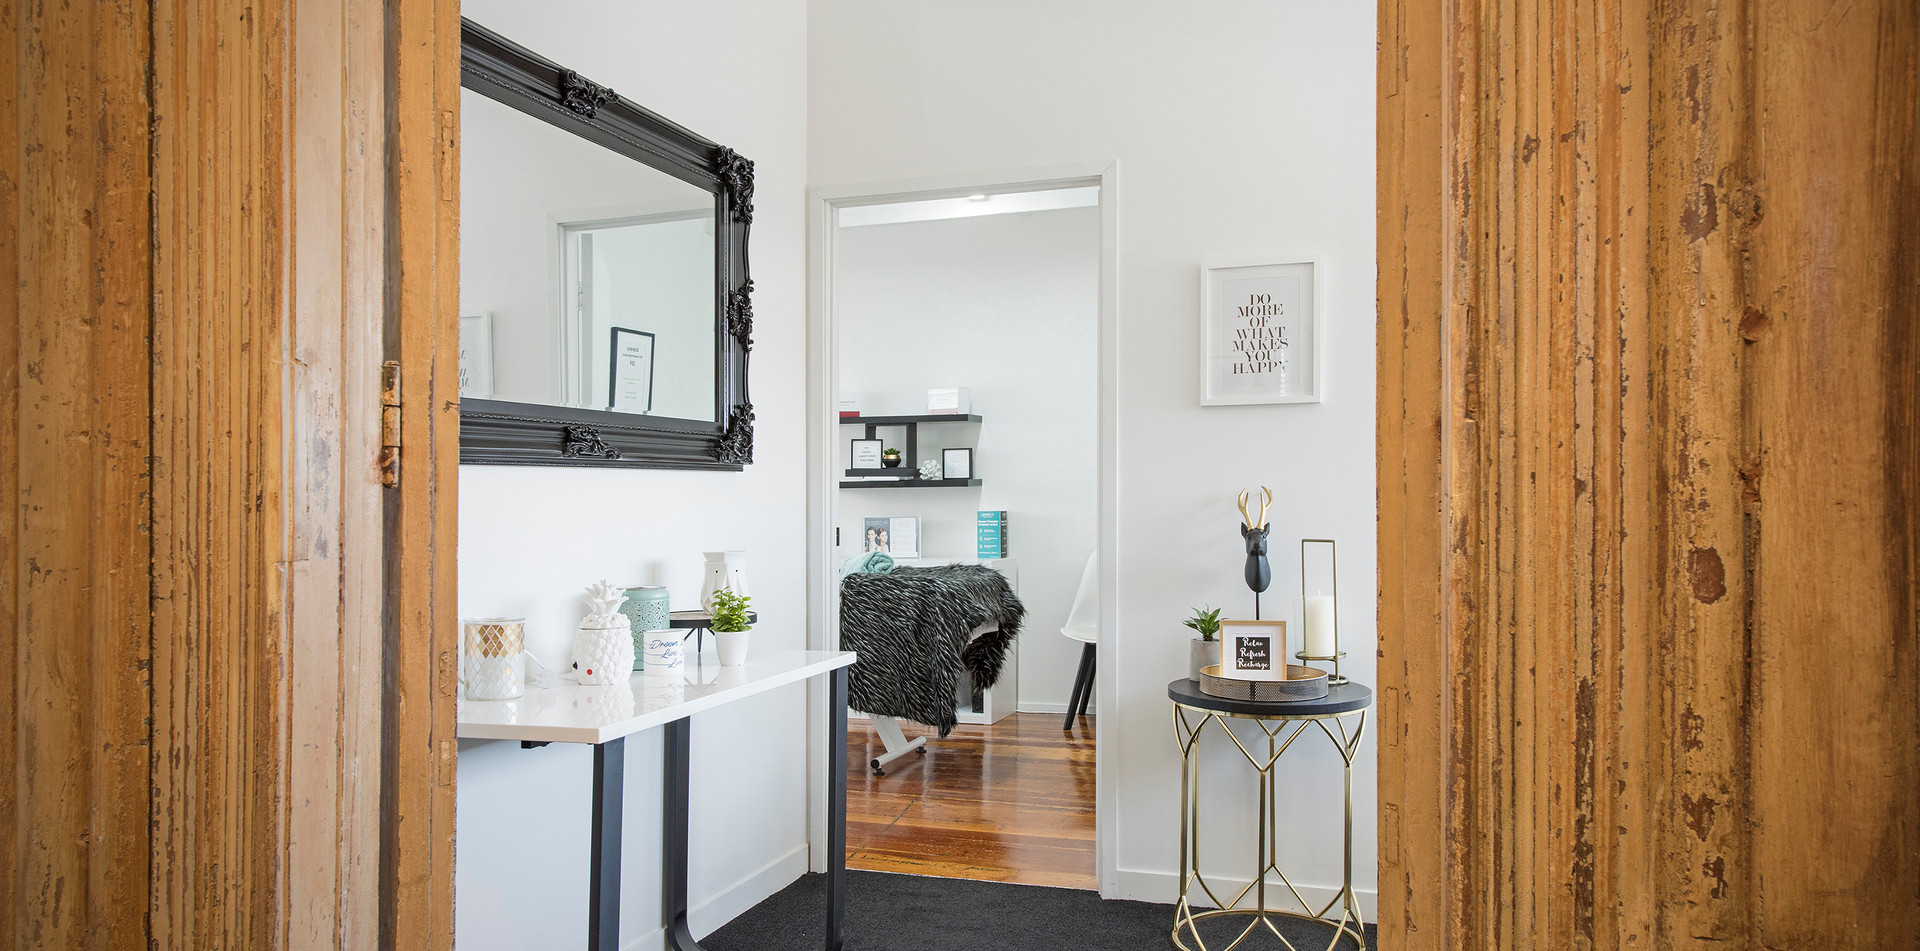 Exquisite Laser Clinic Salon